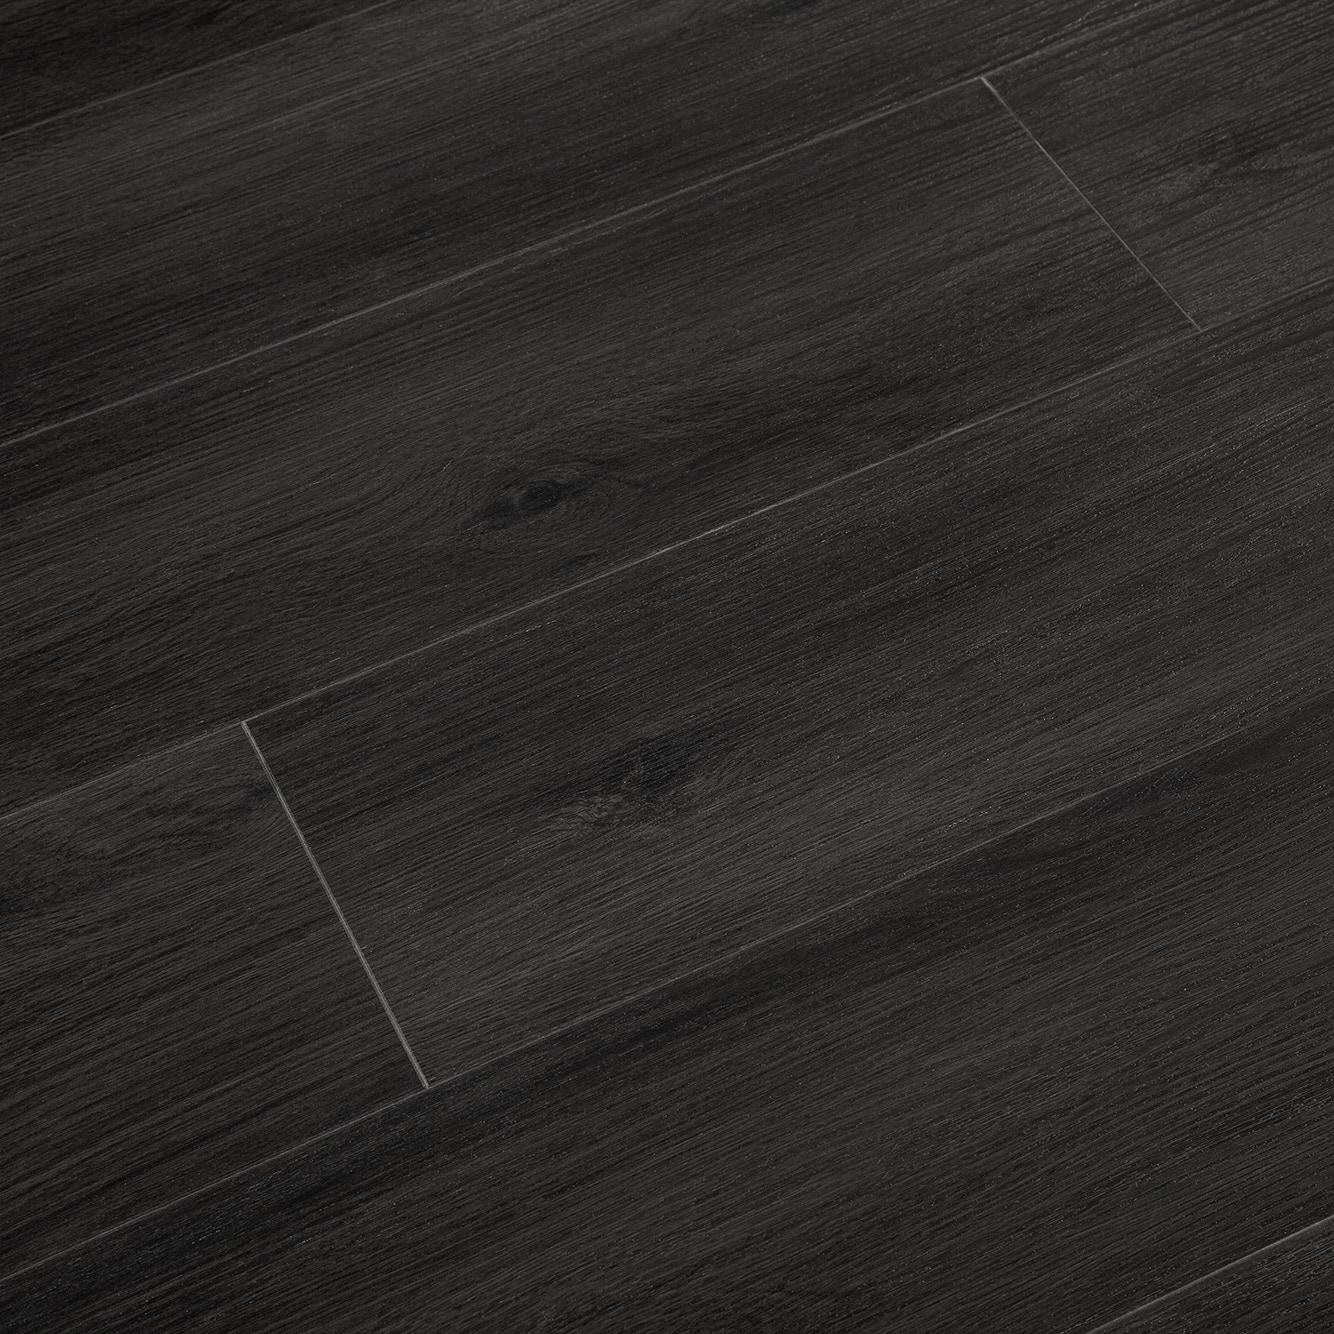 Nobel Black Oak / 7mm / SPC / Click Lock Vinyl Planks - 7mm SPC Click Lock - XL Route 66 Collection 0